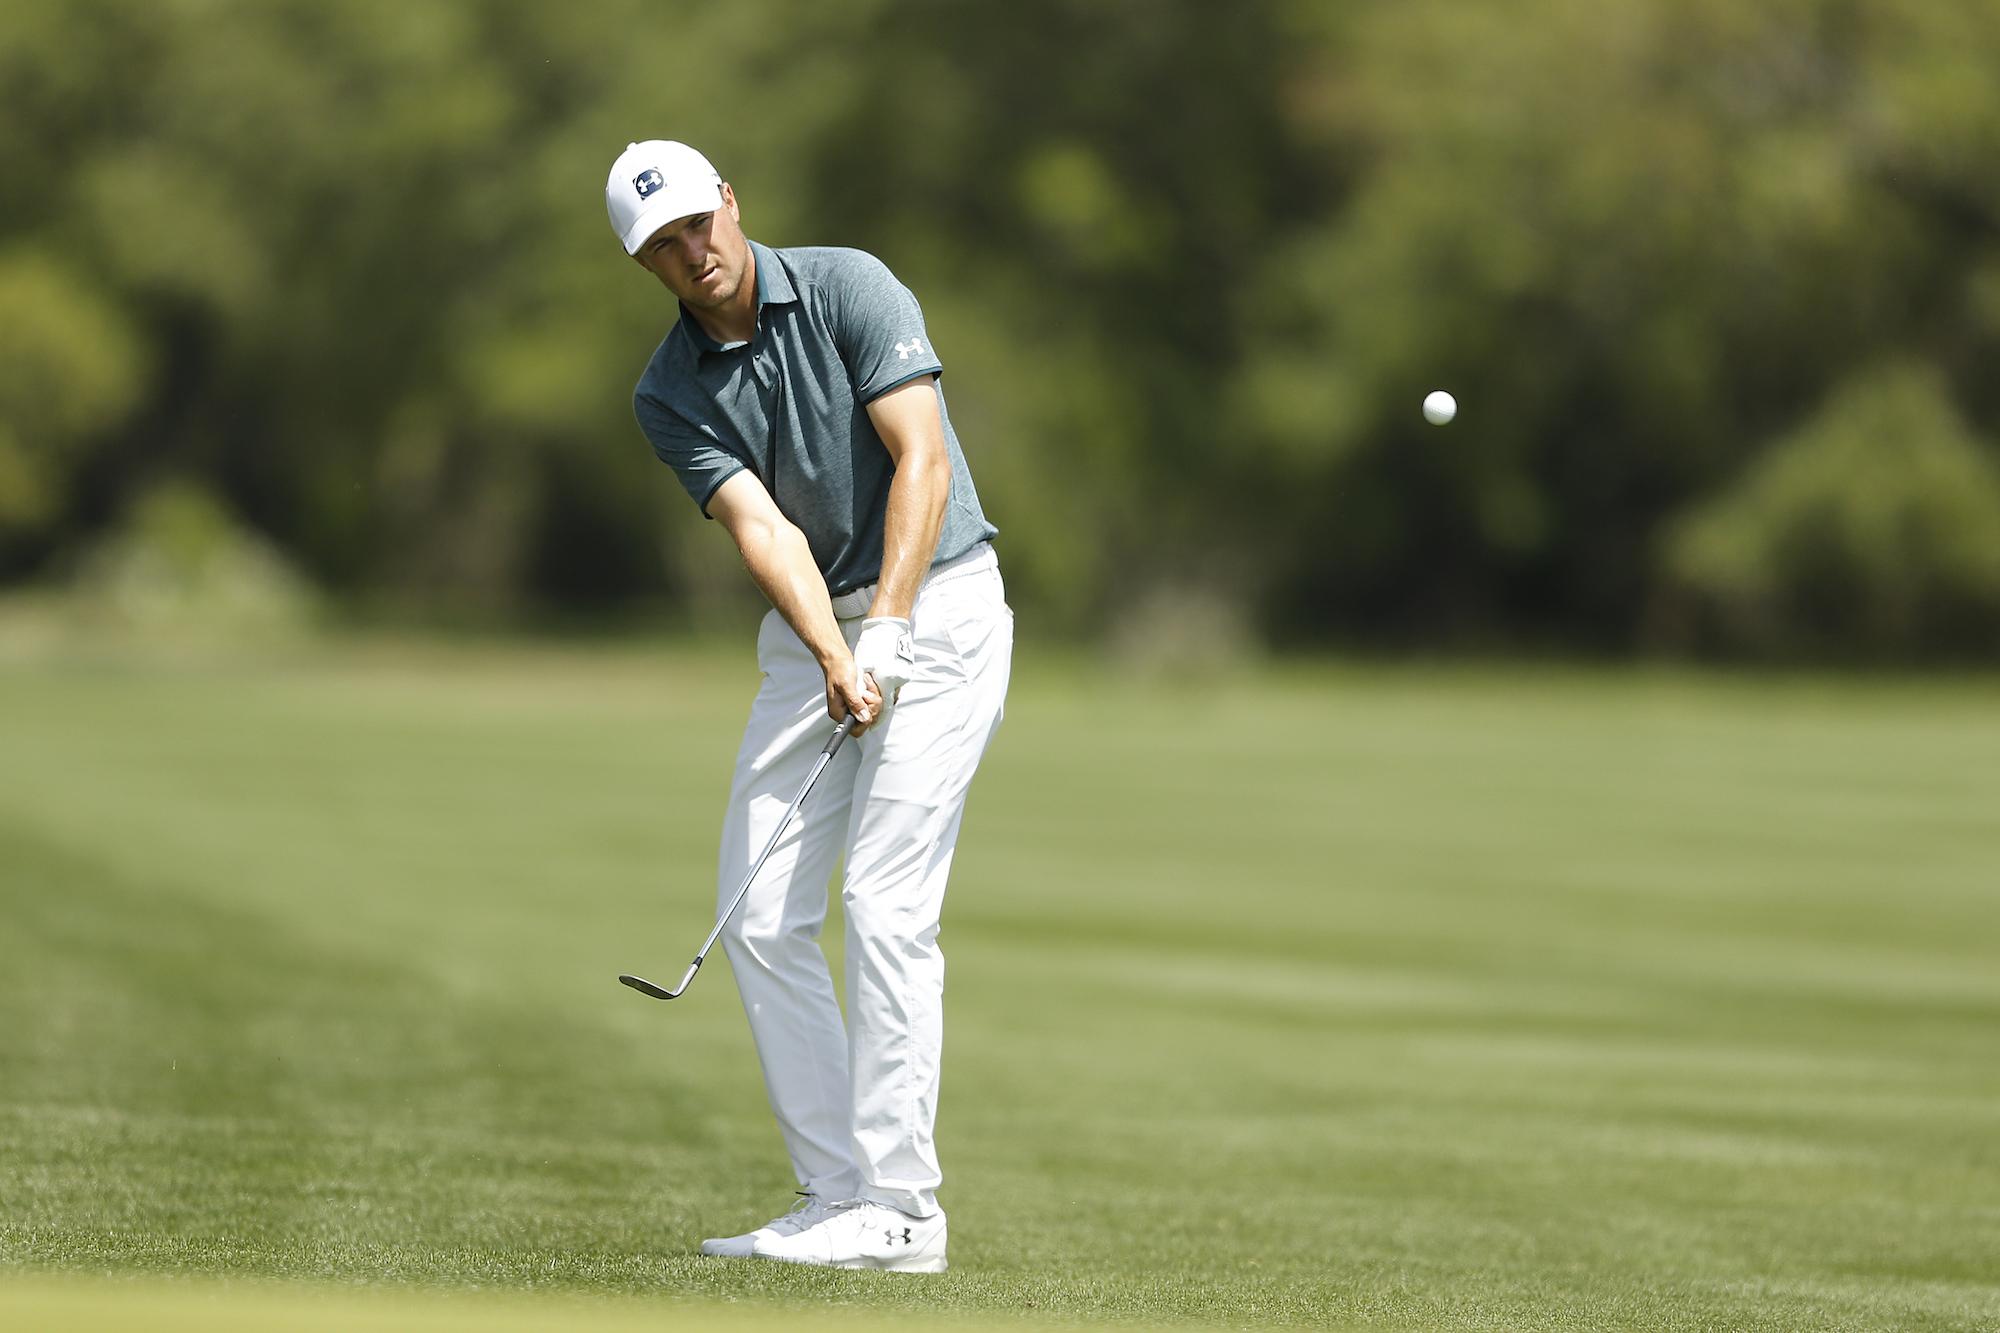 2019 Valero Texas Open: Round 1 - Wedge Play on No. 4